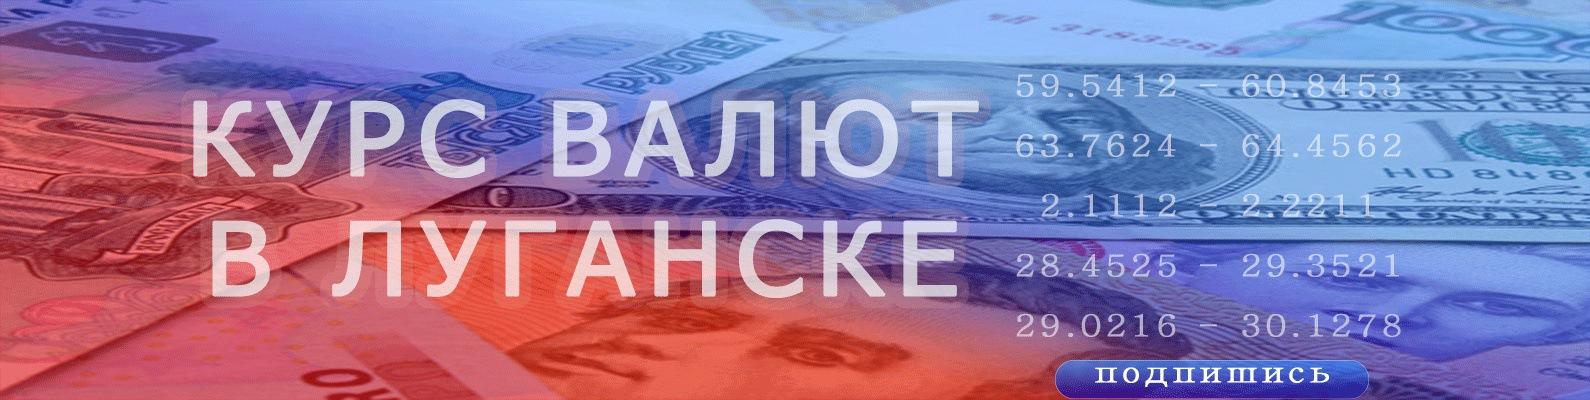 Обмен paypal btc от 100 руб